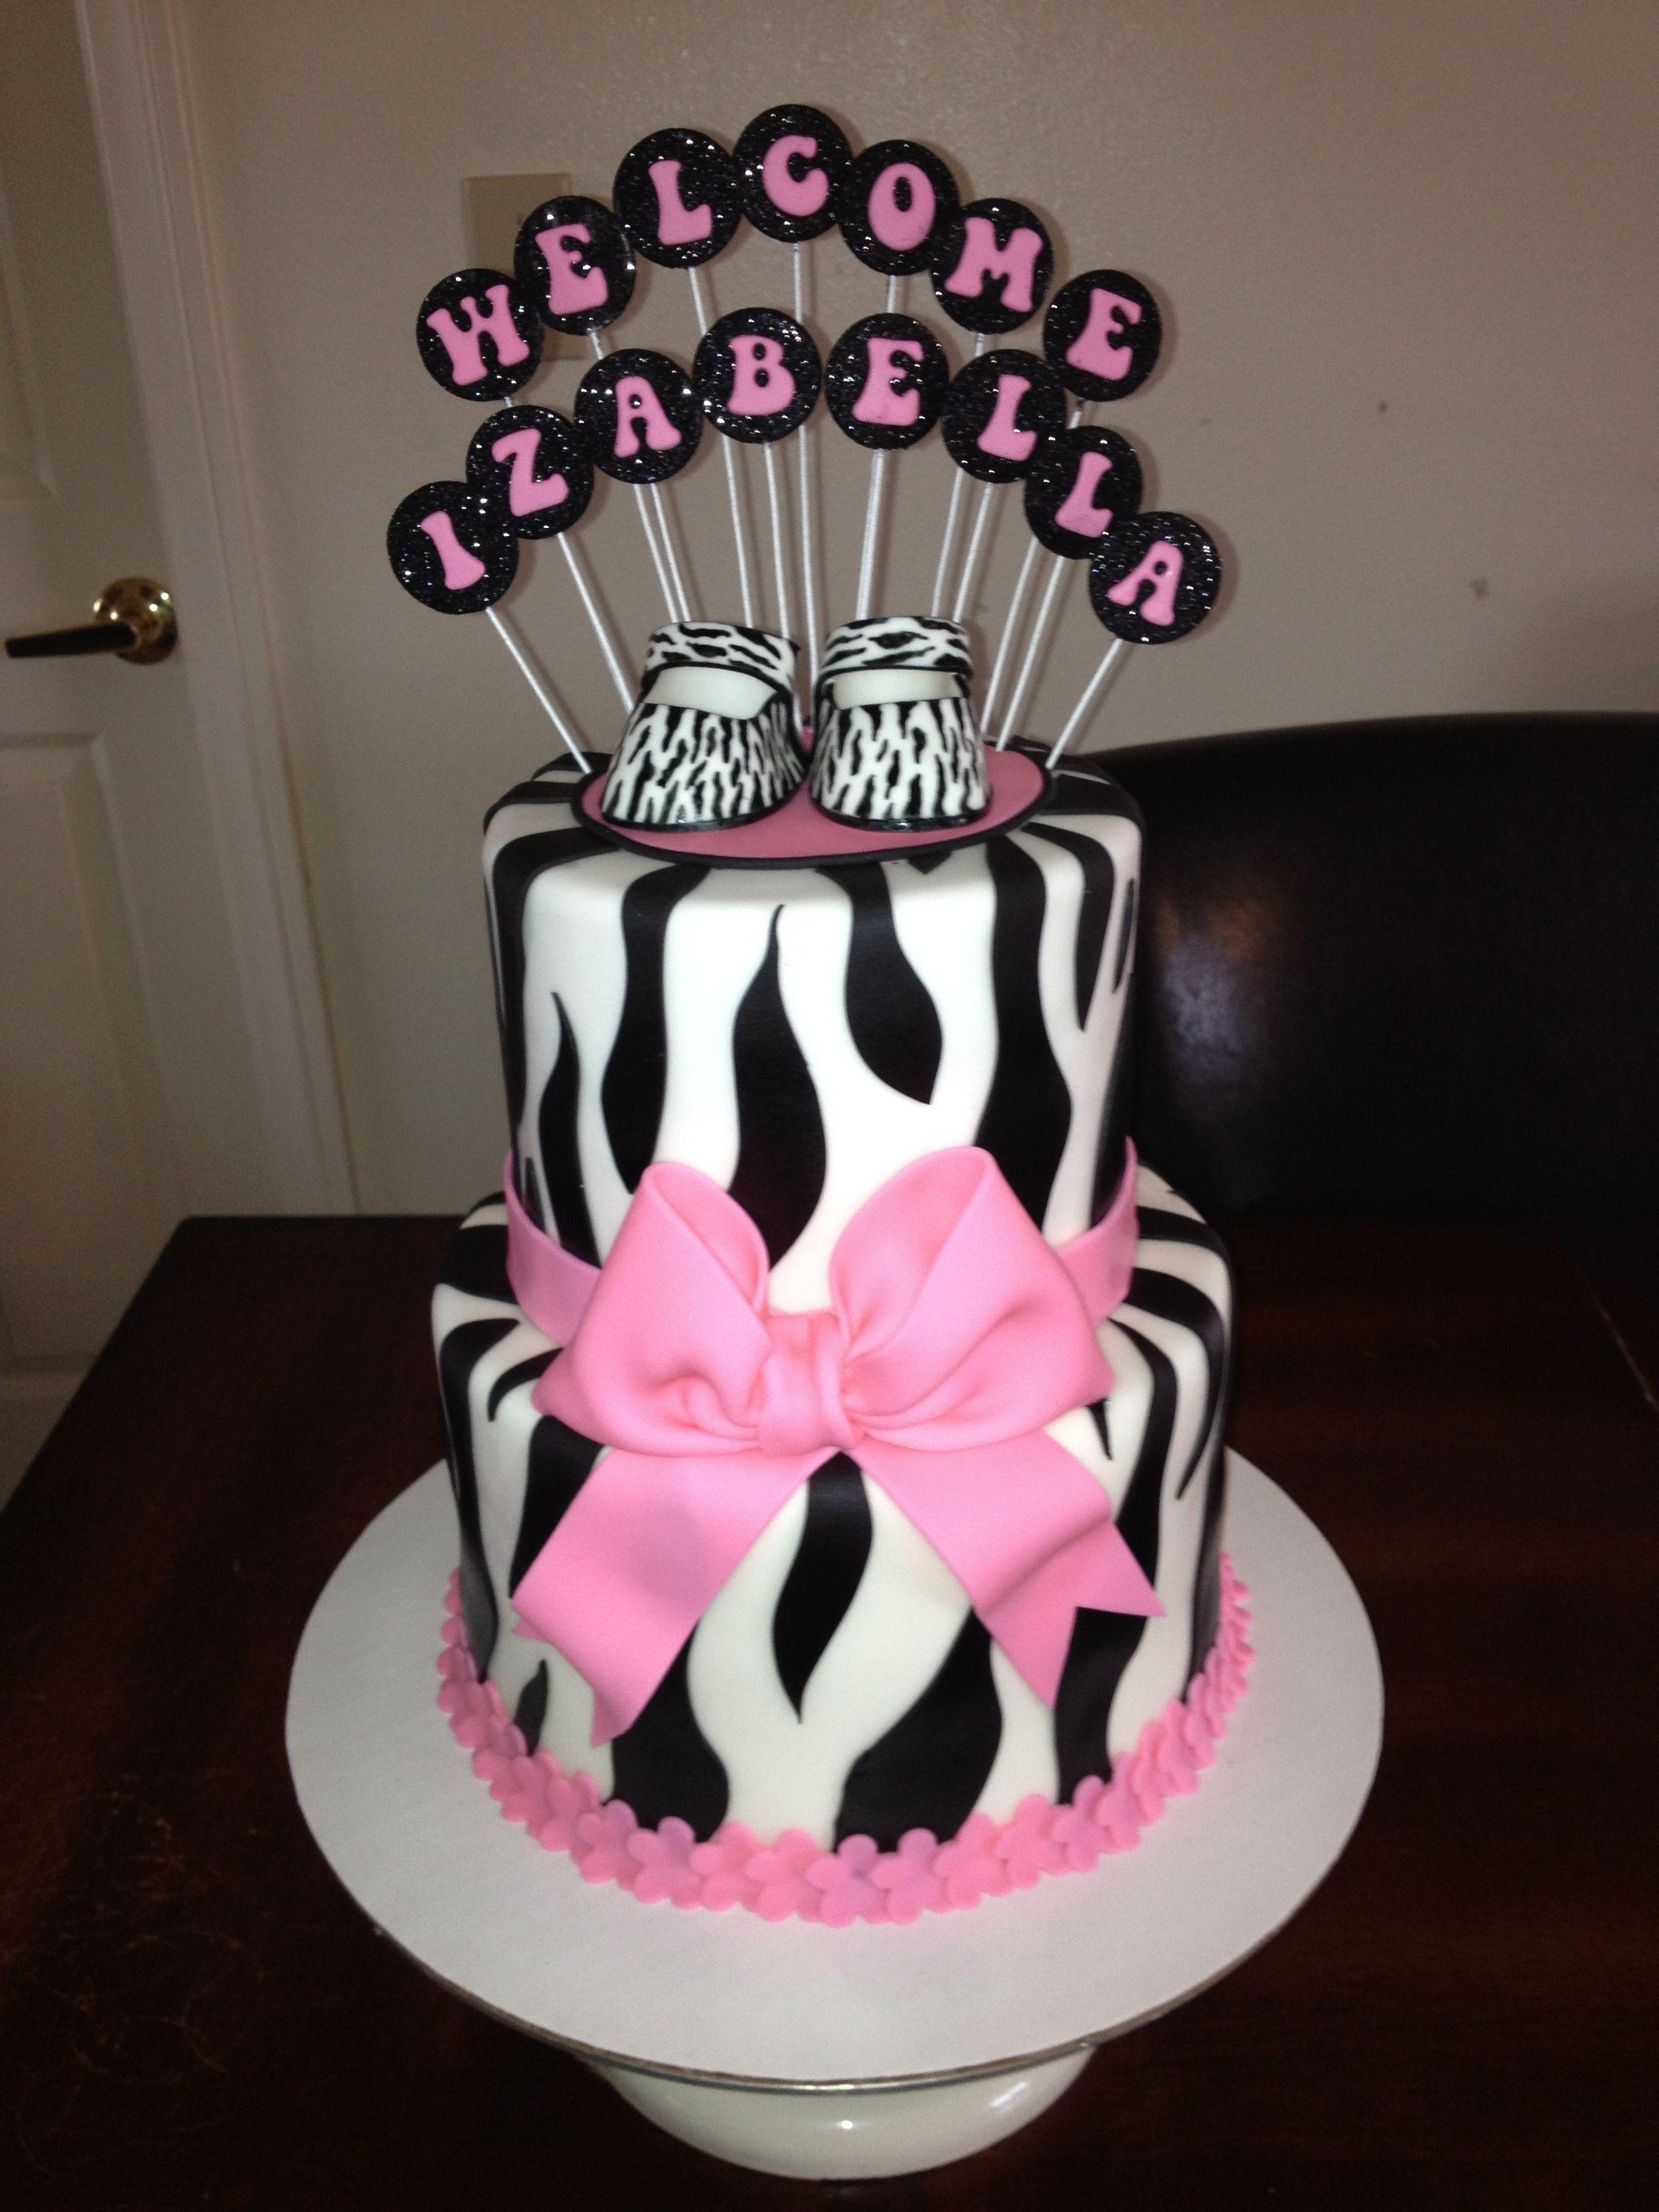 Pink Zebra Baby Shower Cake With Fondant Zebra Print Baby Shoes